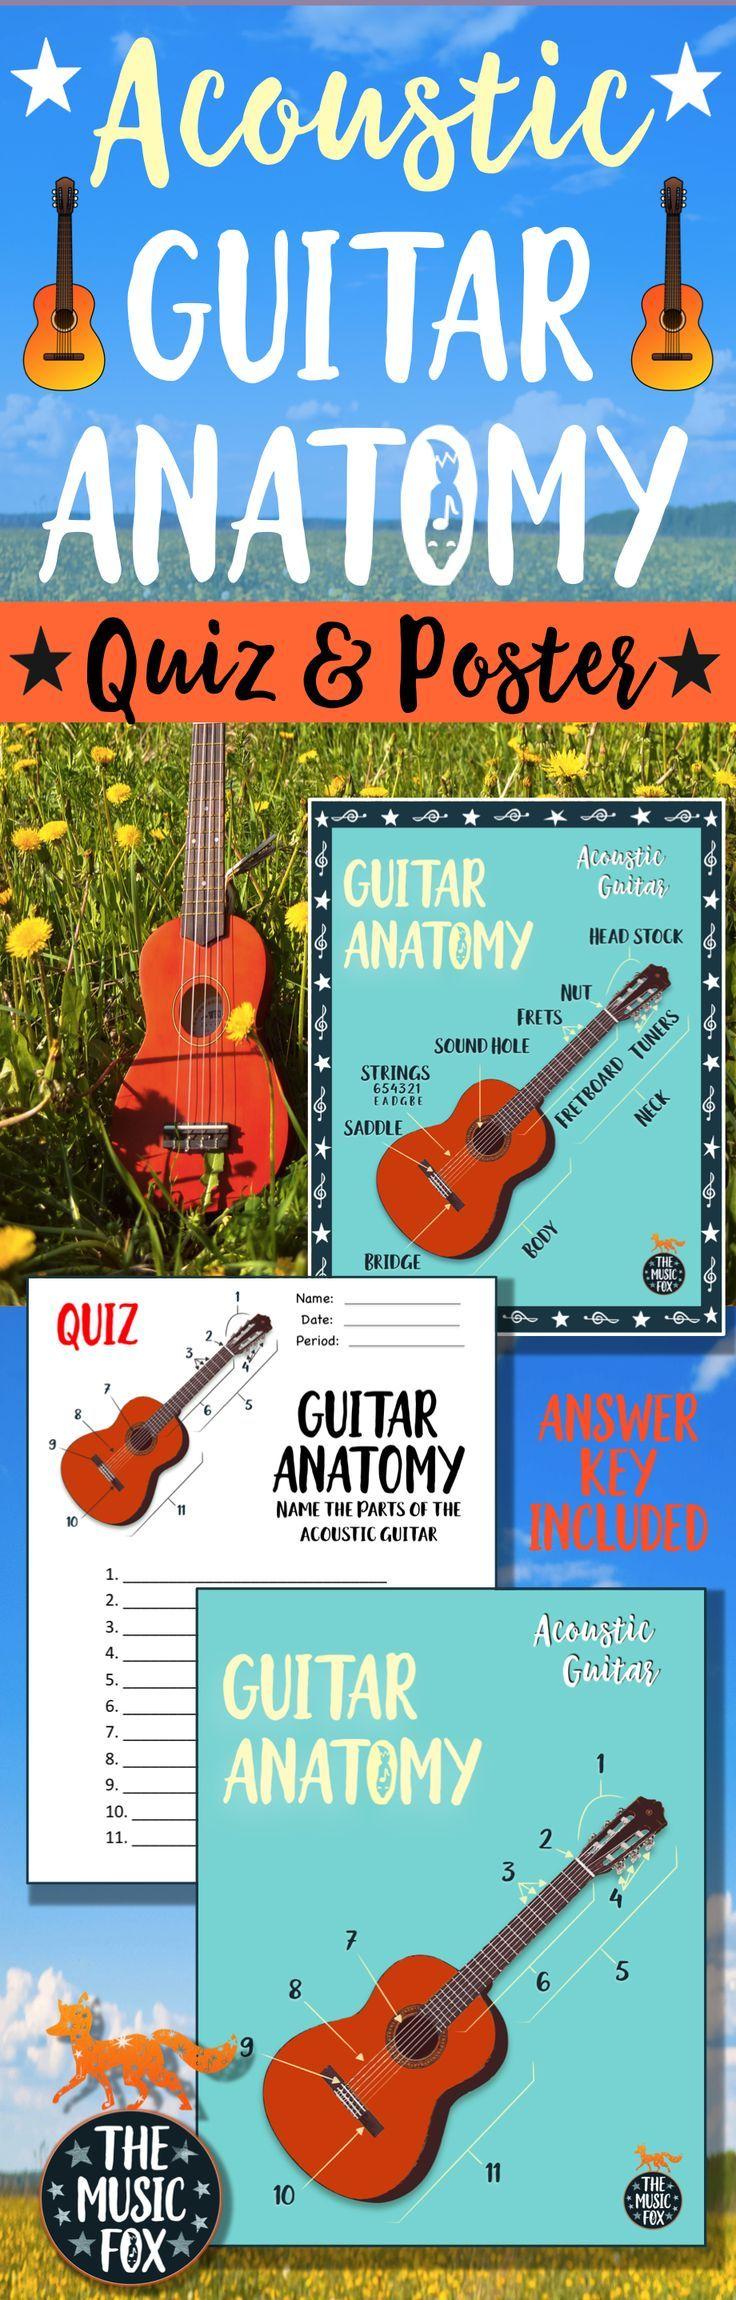 ACOUSTIC GUITAR Anatomy Poster *COLOR & B+W* (Grades 3-12) | Smart ...